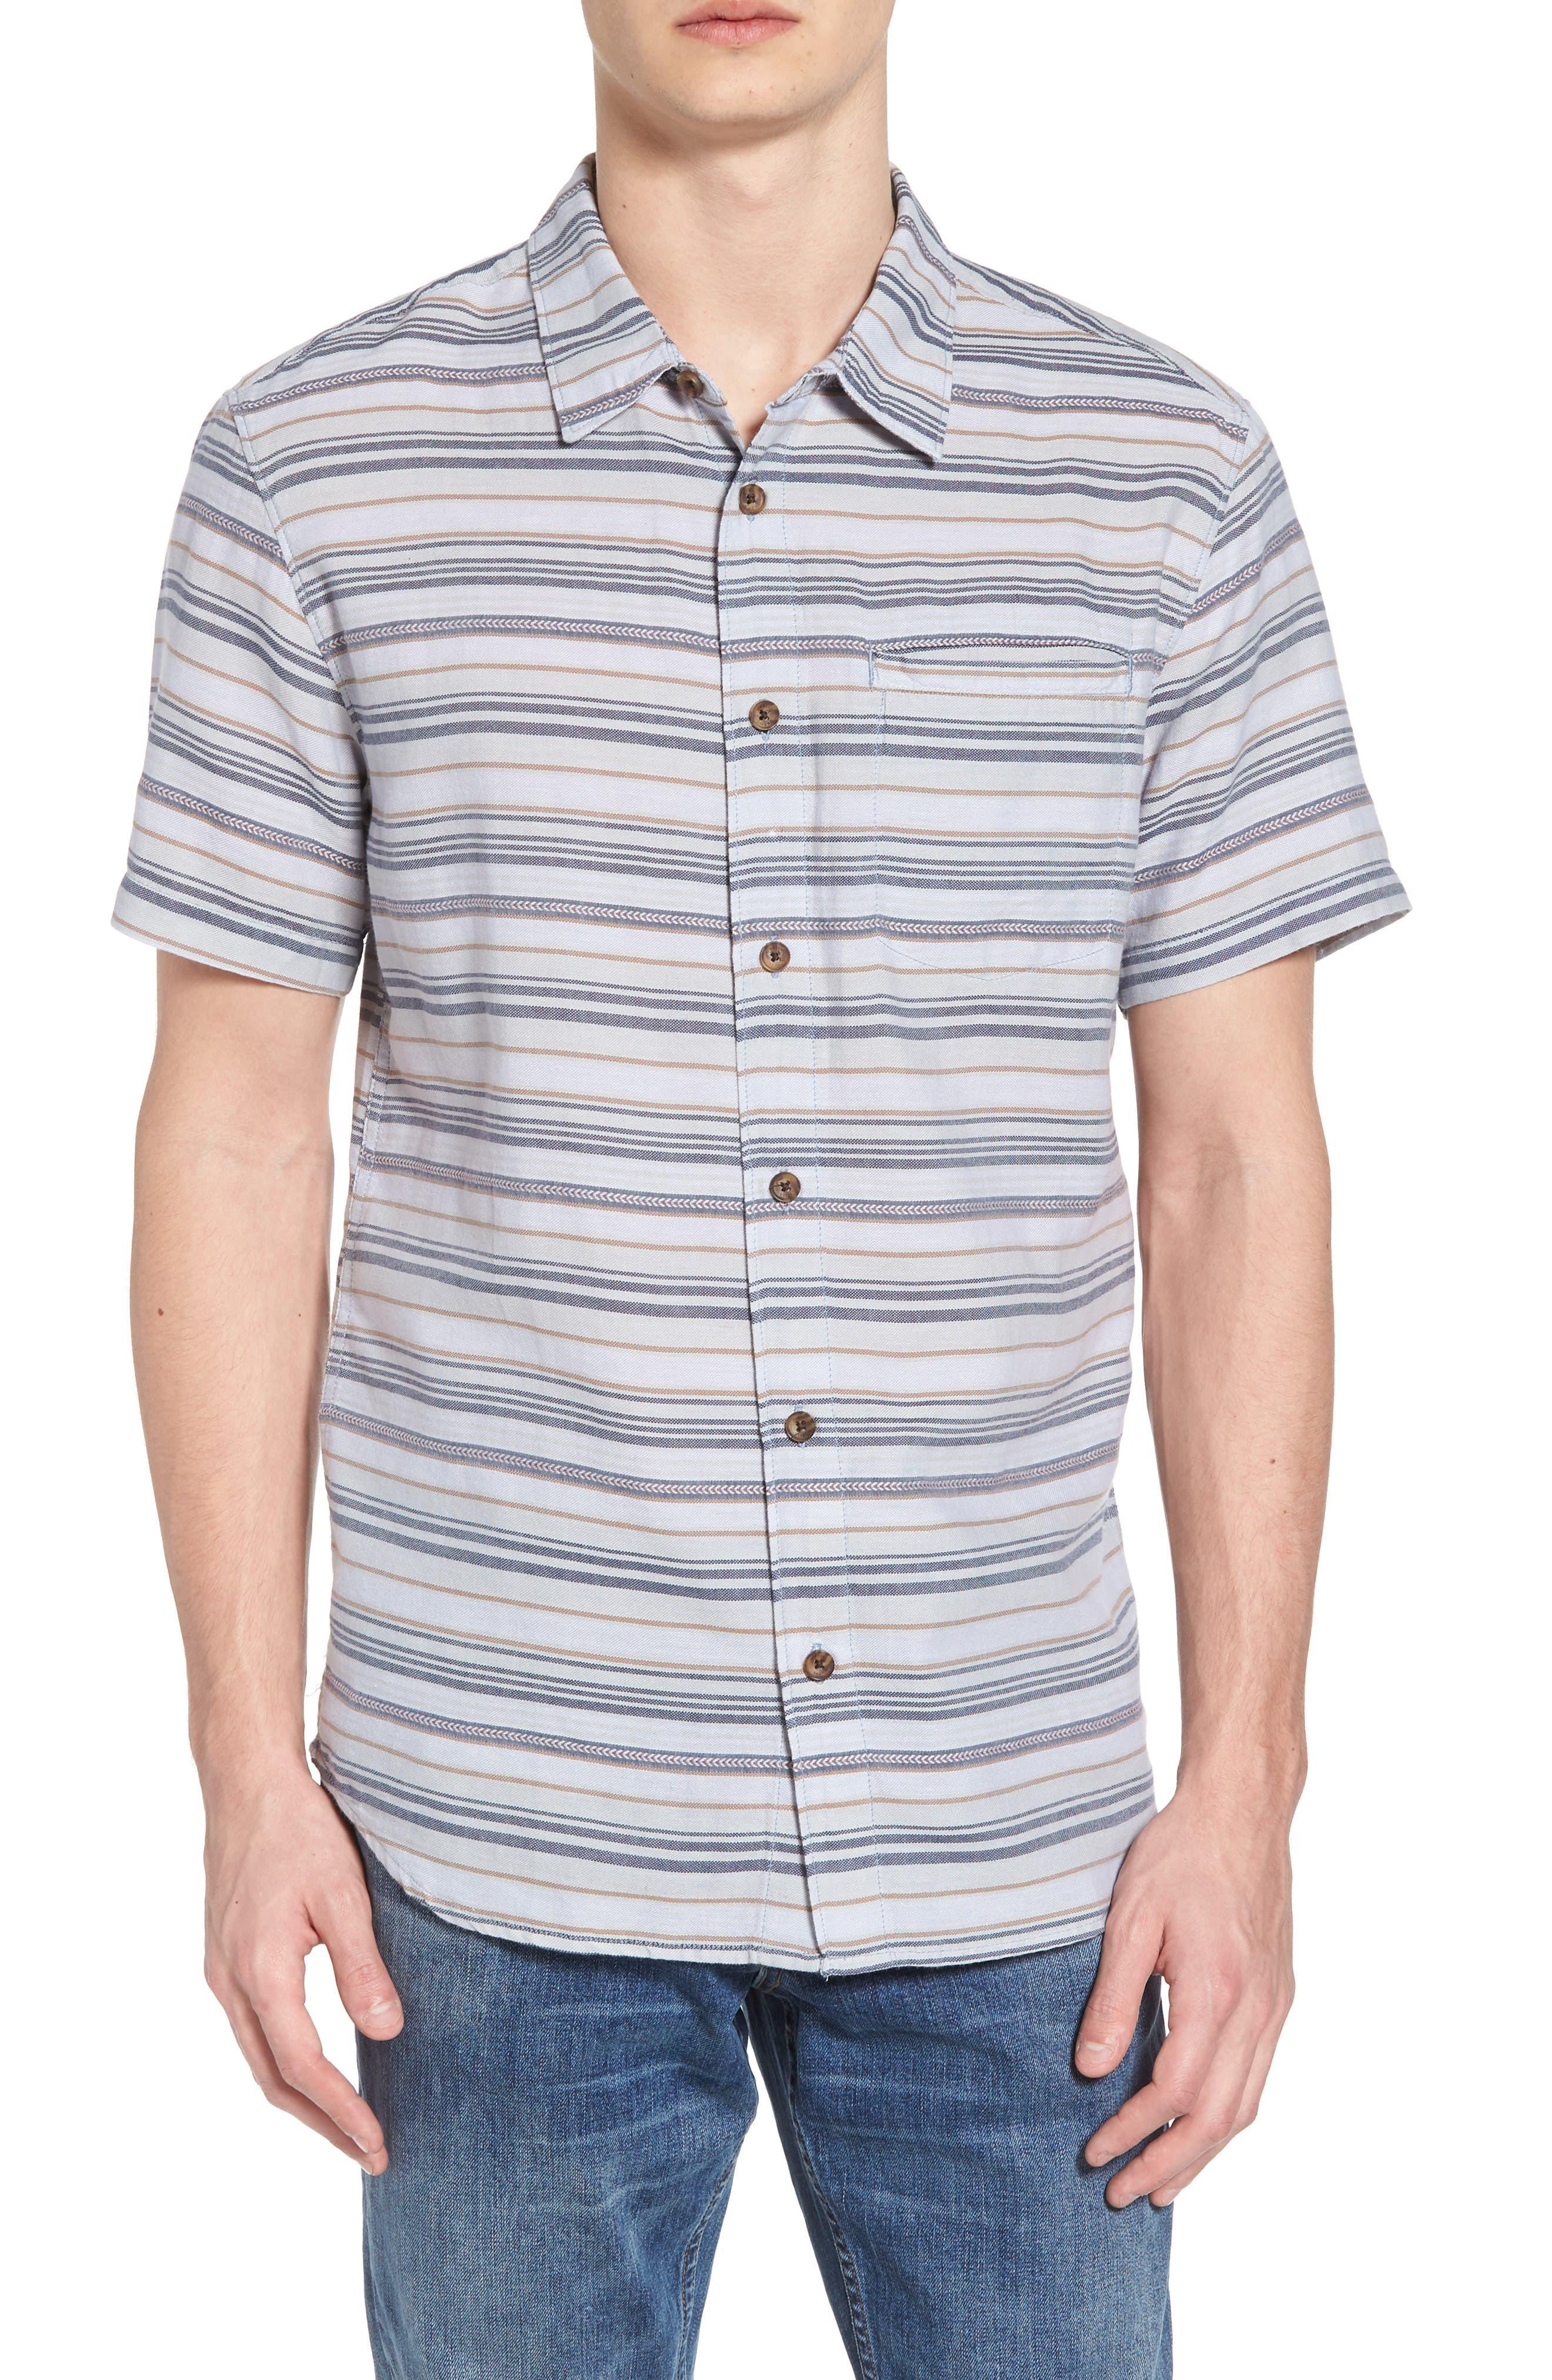 Currington Short Sleeve Shirt,                             Main thumbnail 1, color,                             Light Blue